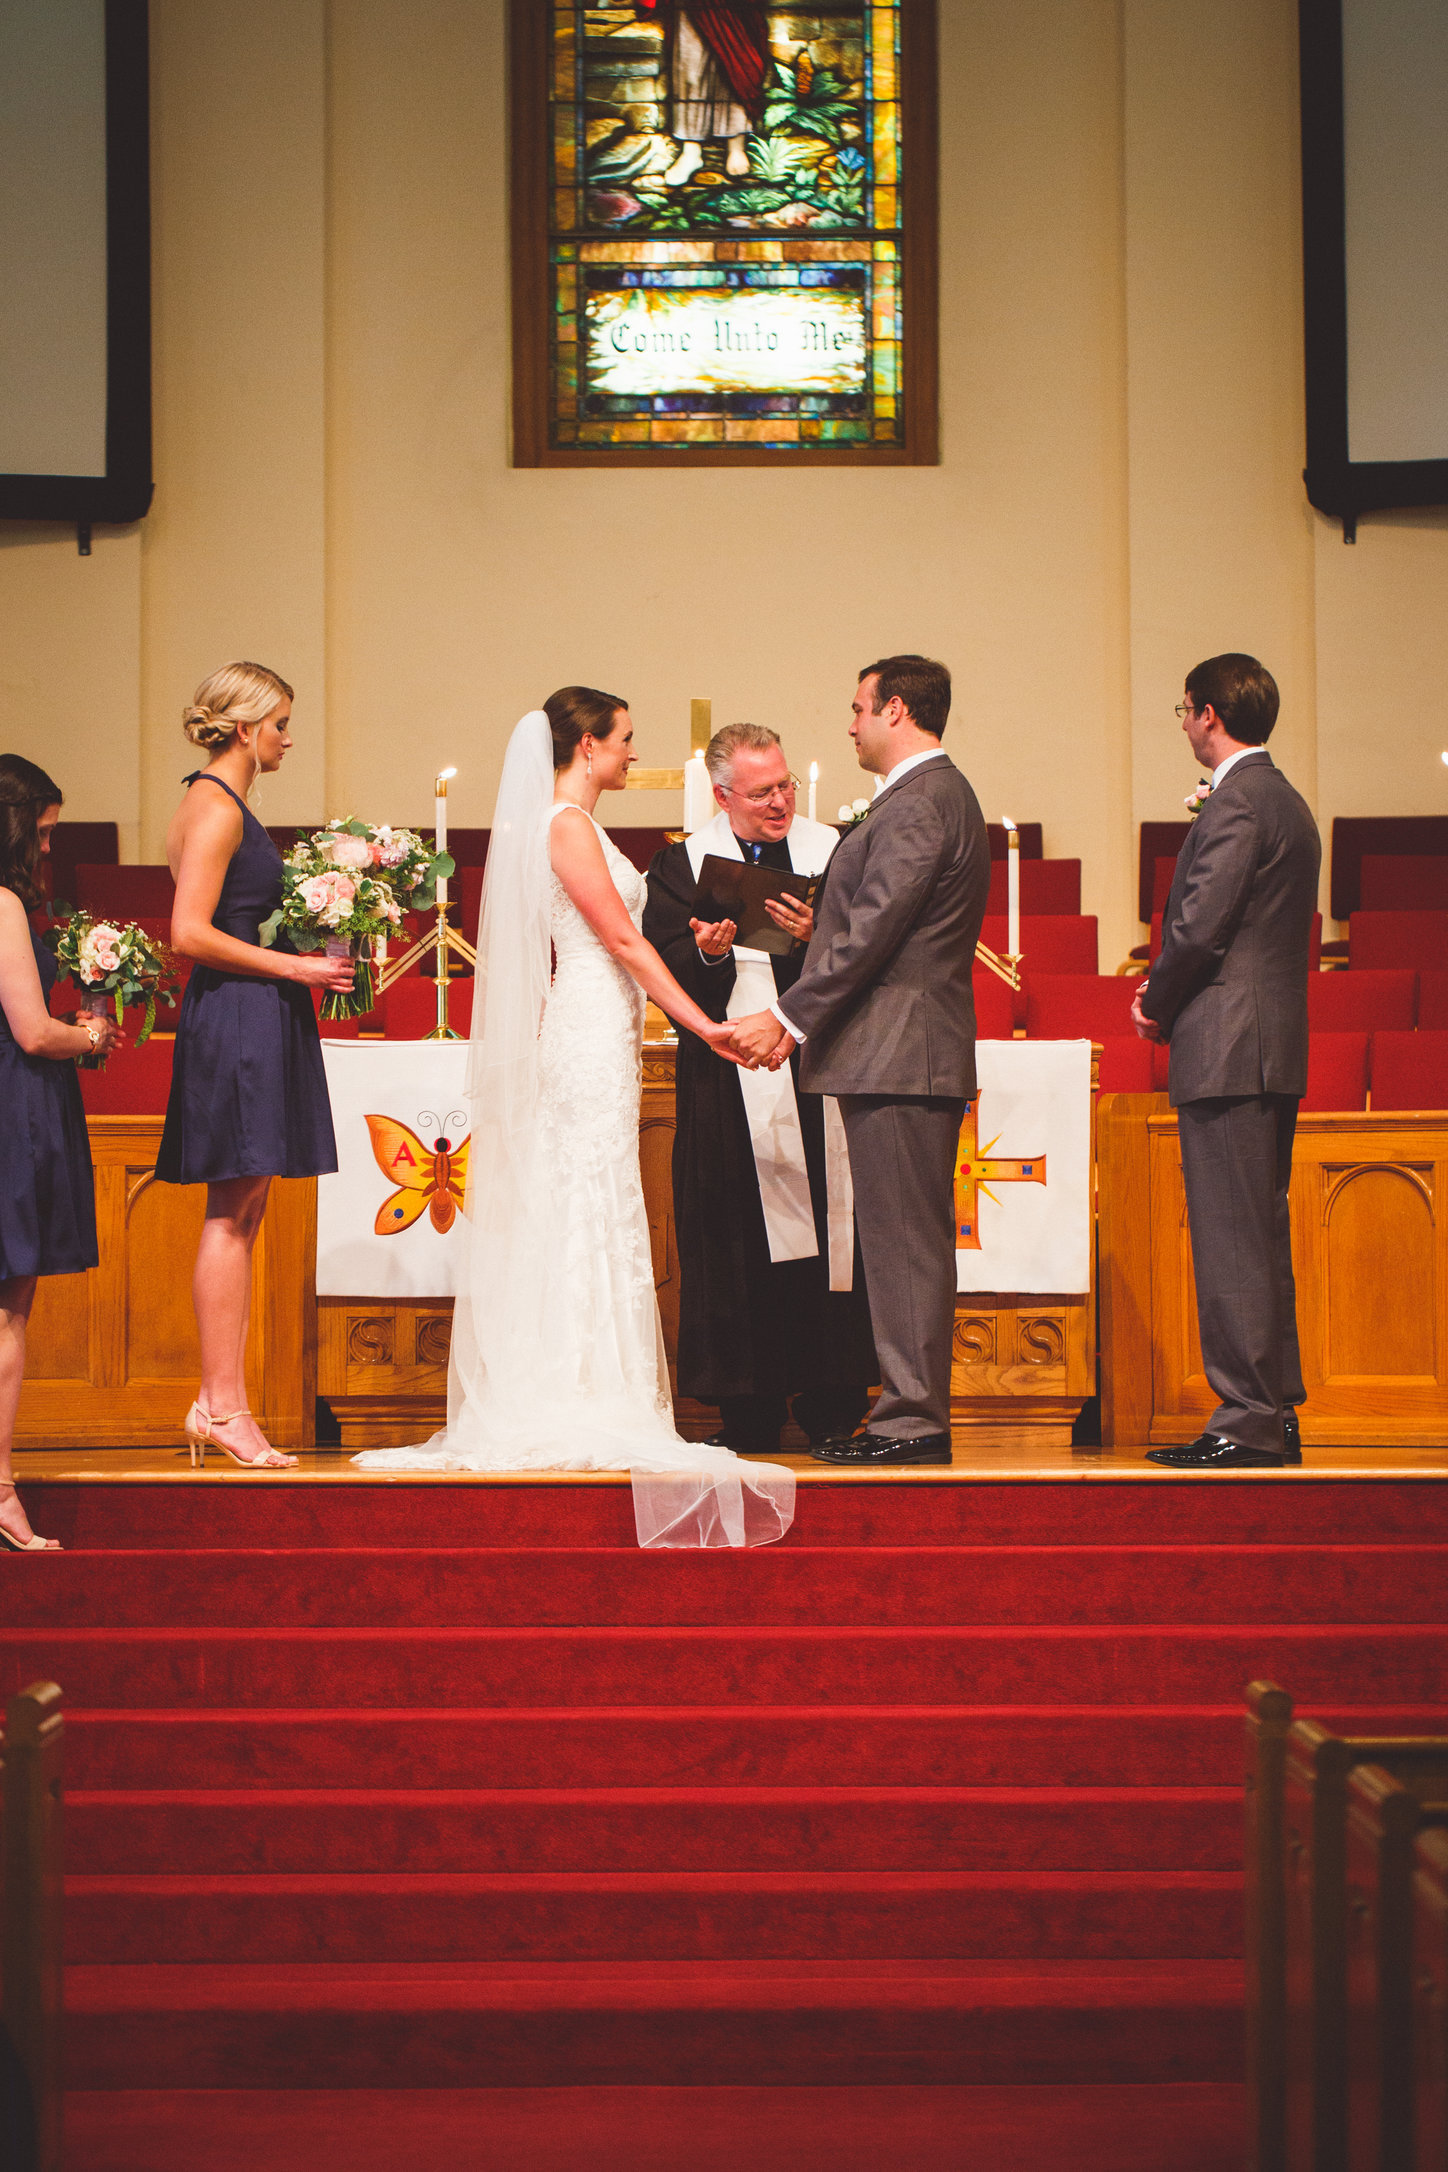 SandC-wedding-203.jpg